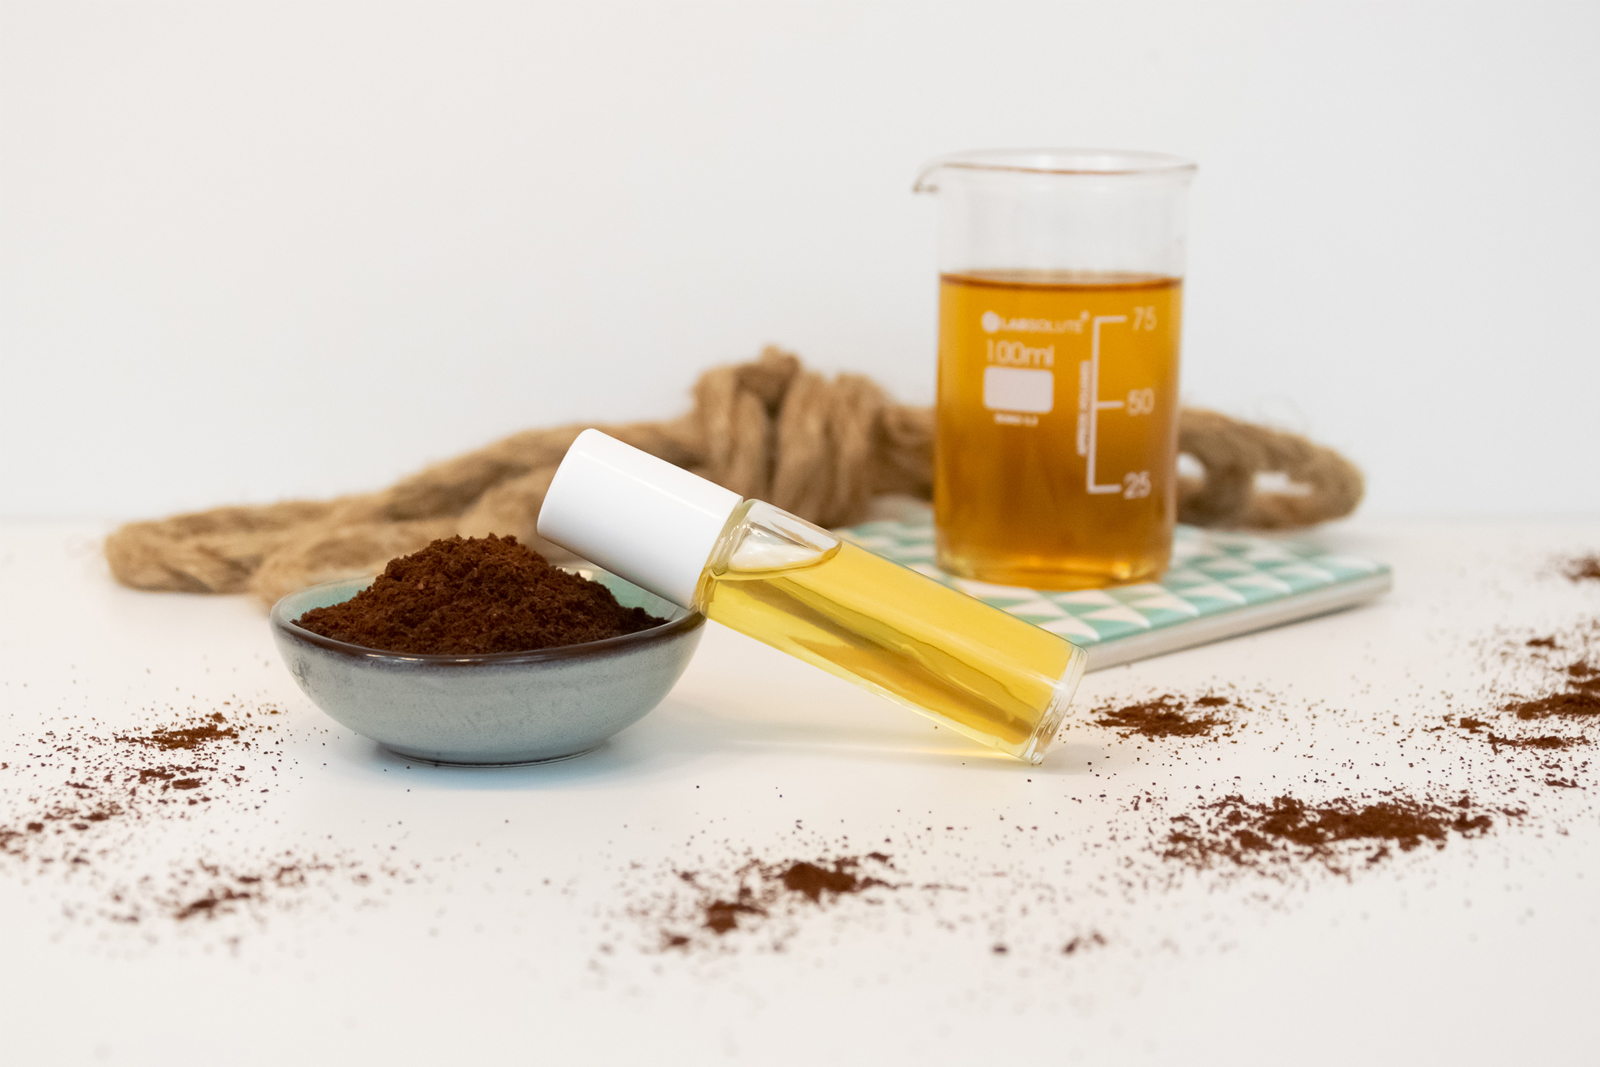 Koffein-Augen-Roll-On Intensivaugenpflege Naturkosmetik